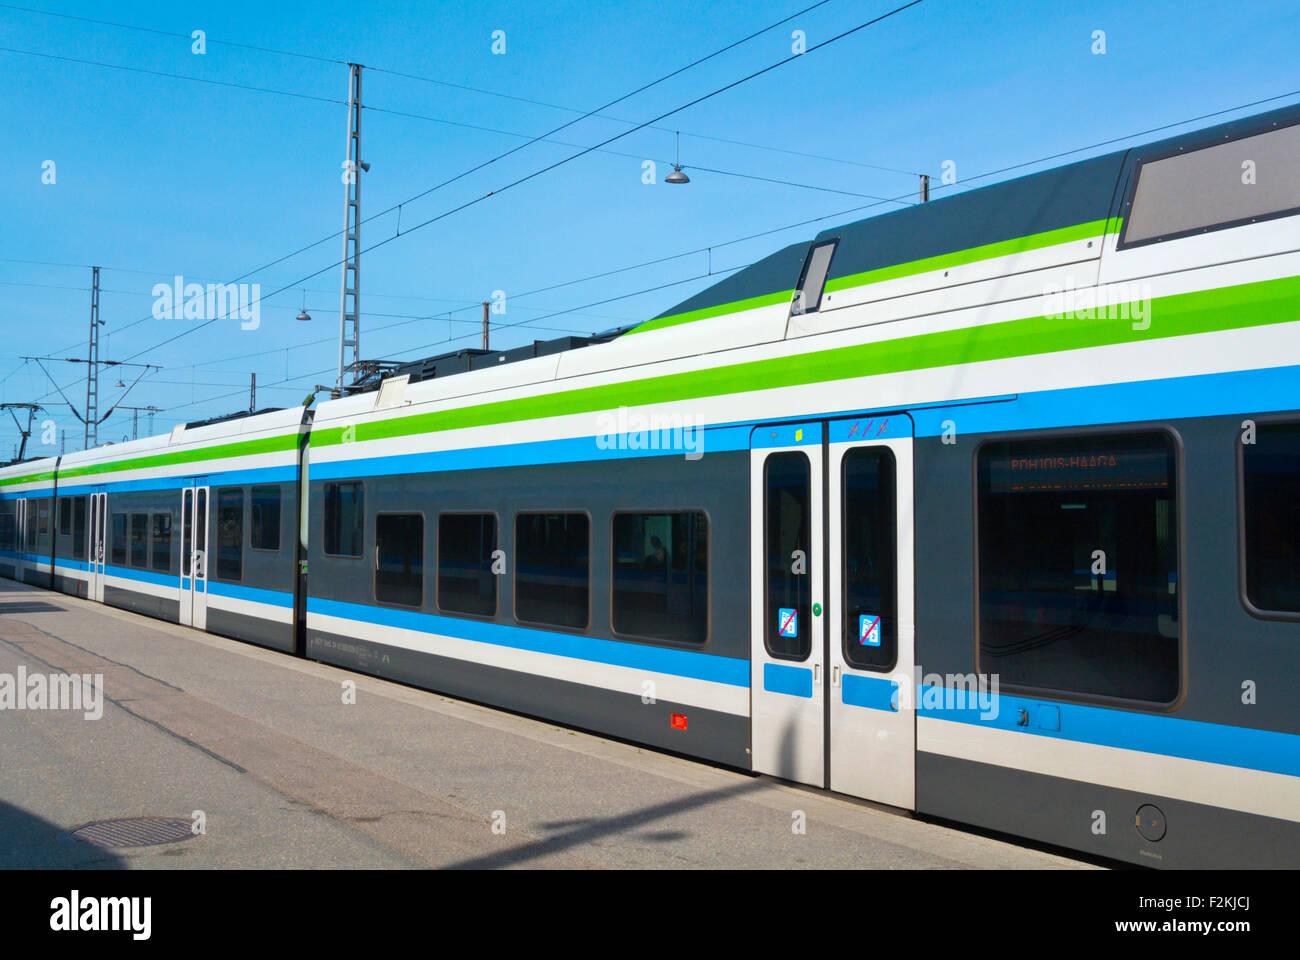 Train on station platform, Finland, Europe - Stock Image